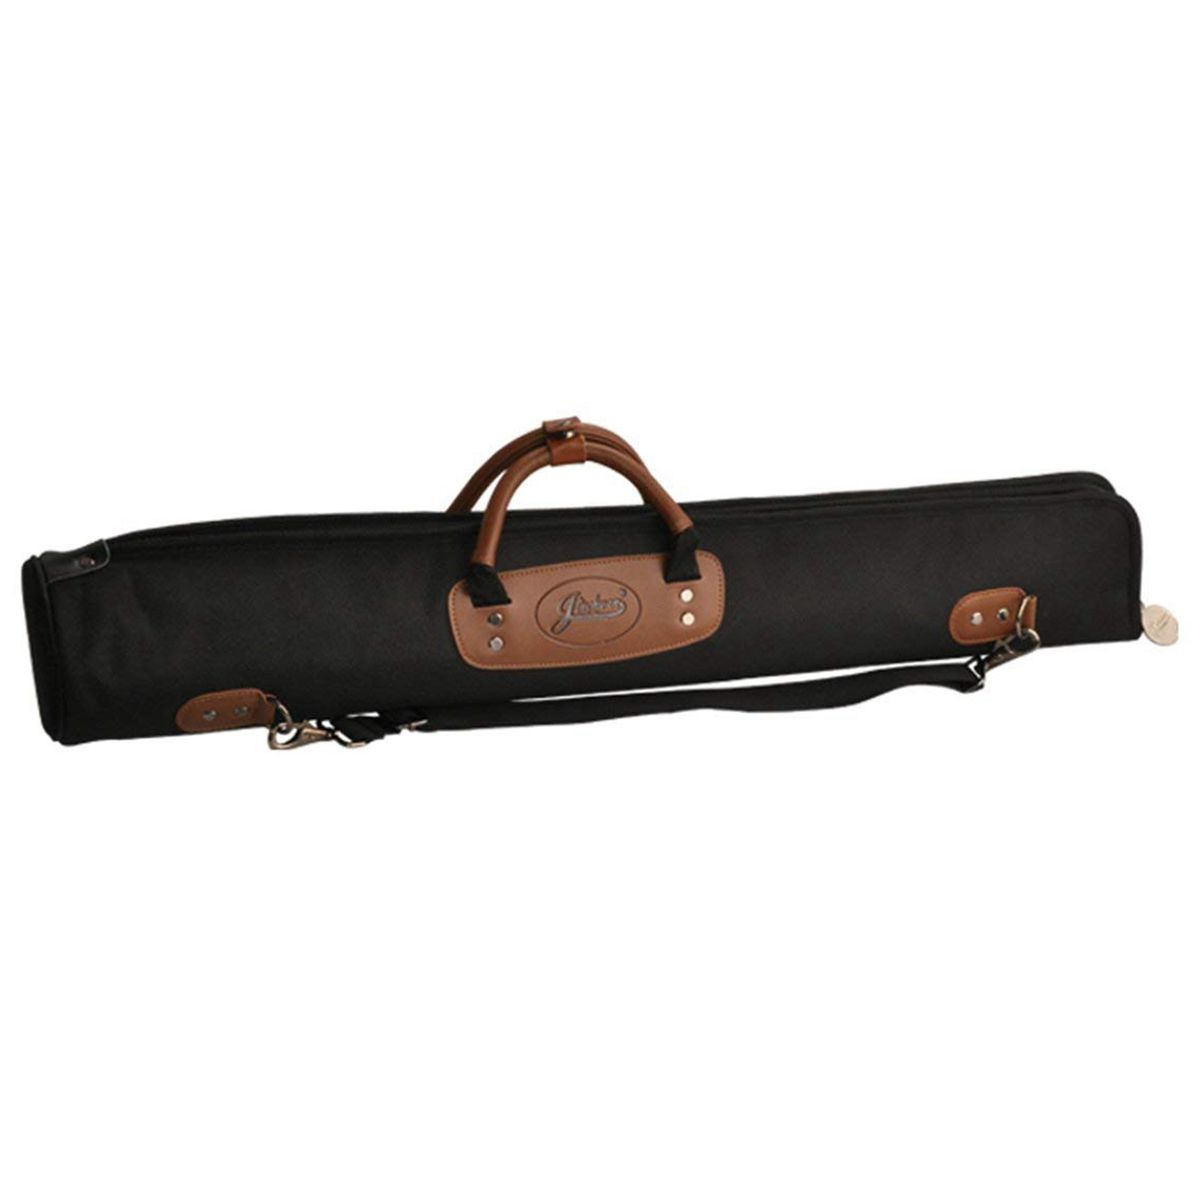 HOT-JINCHUAN Soprano Saxophone Bag & Case 1200D Water-resistant Oxford Cloth bB Saxes handbag and BackpackHOT-JINCHUAN Soprano Saxophone Bag & Case 1200D Water-resistant Oxford Cloth bB Saxes handbag and Backpack